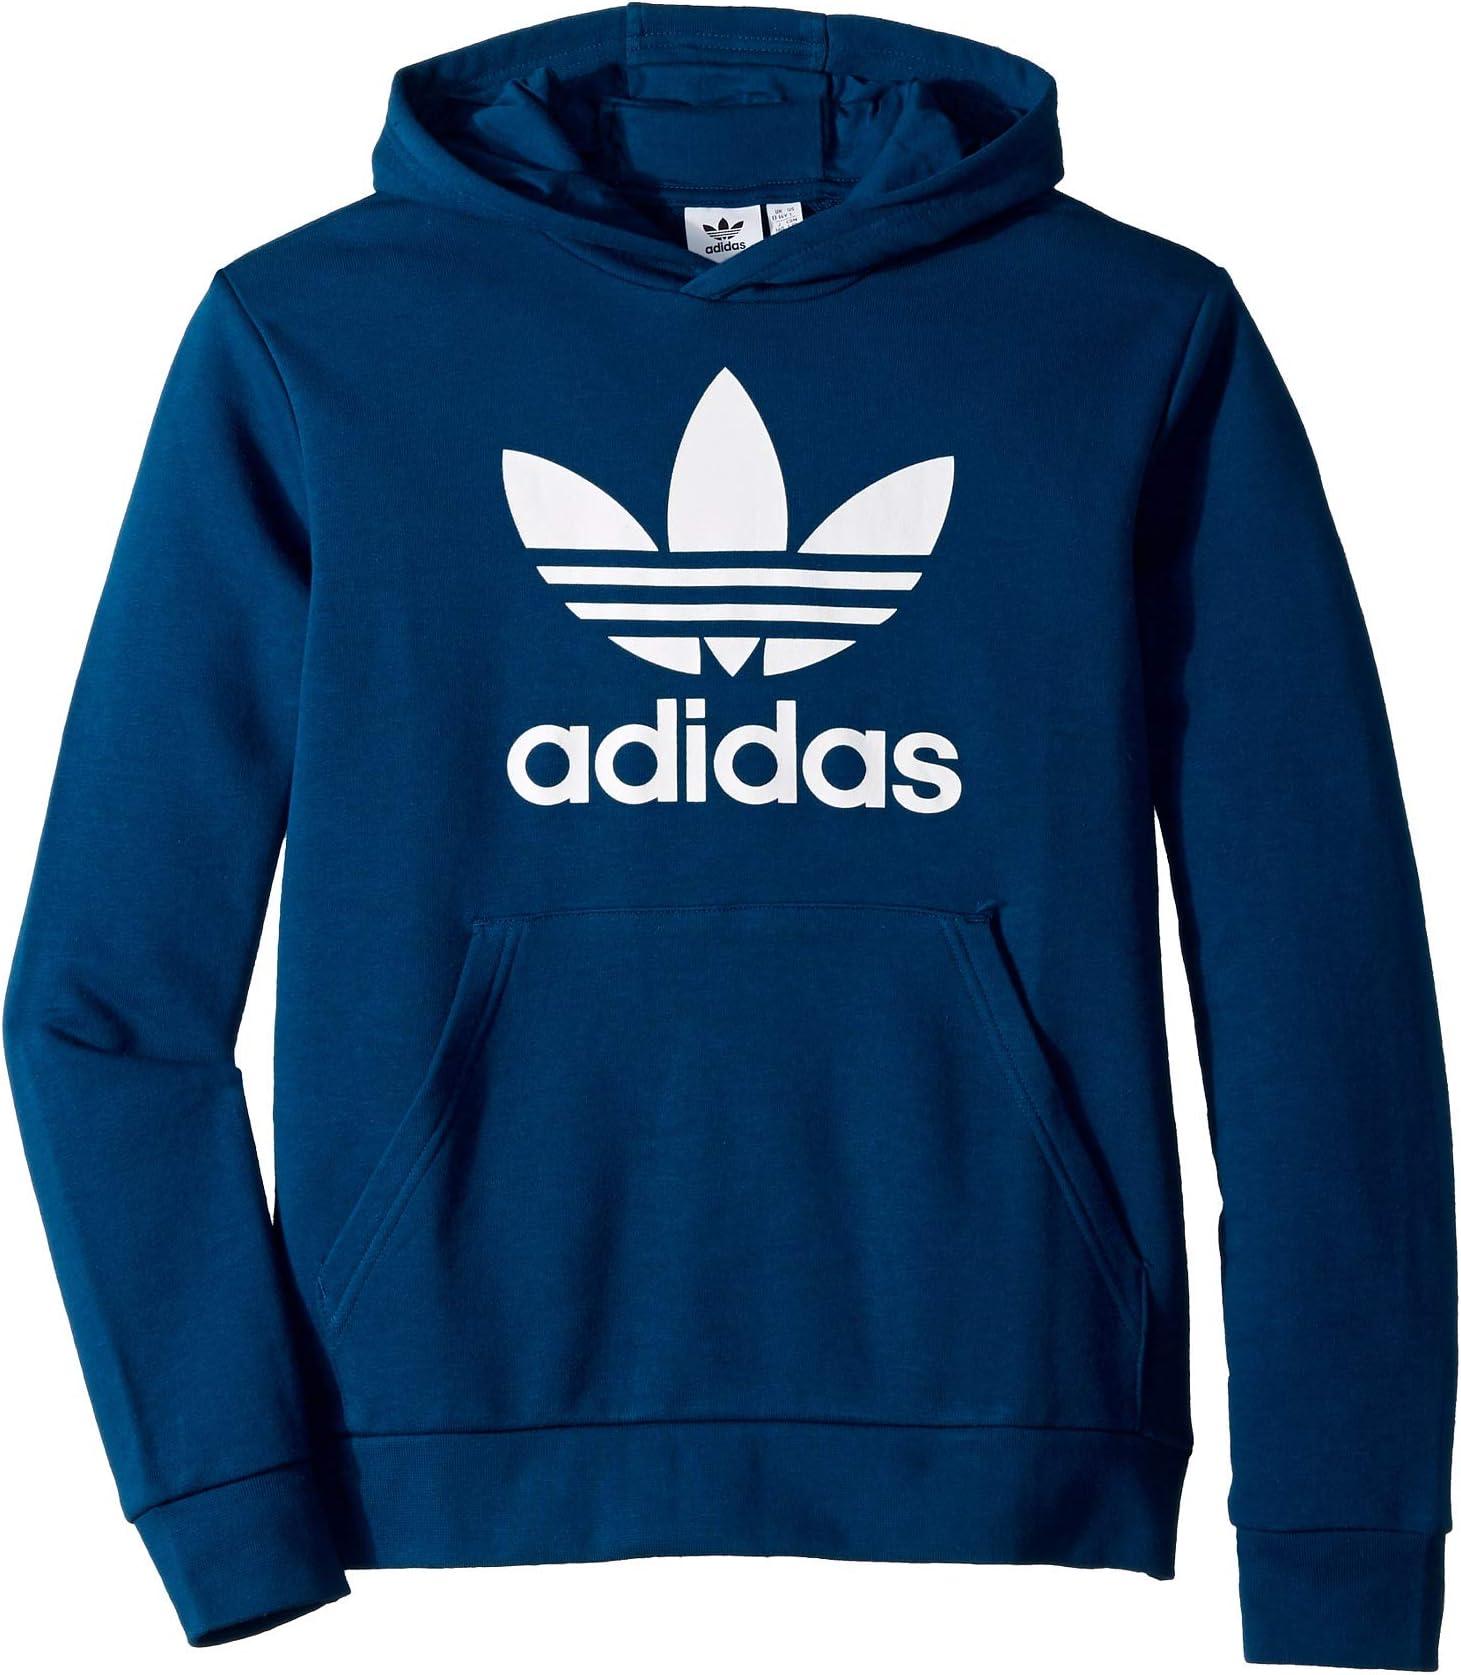 Kids   Free shipping on clothing e1dba4896